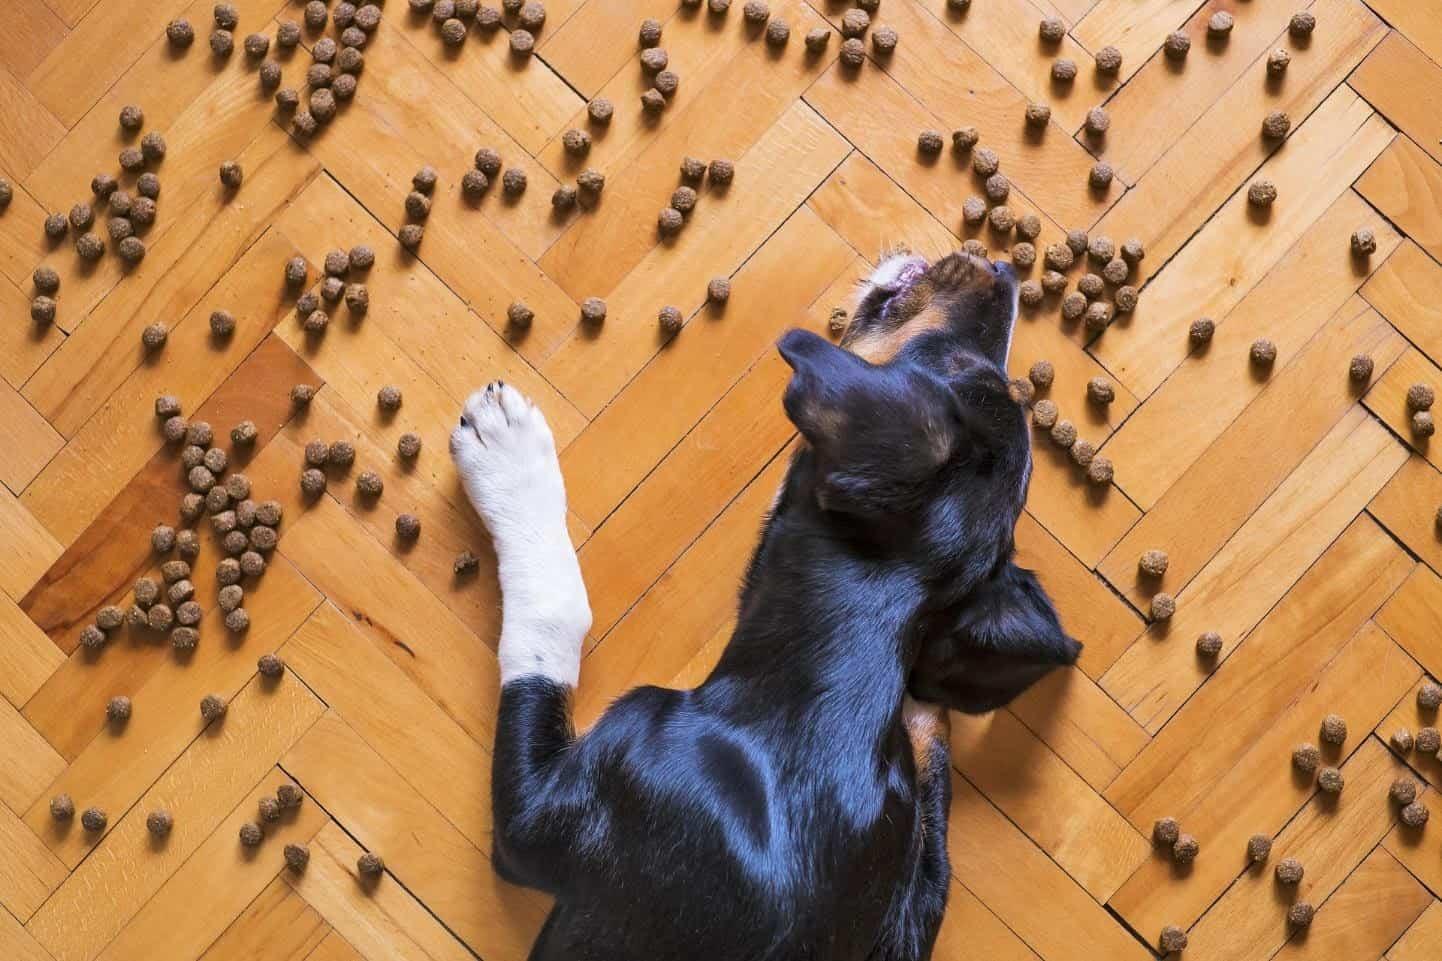 Dog eating treats